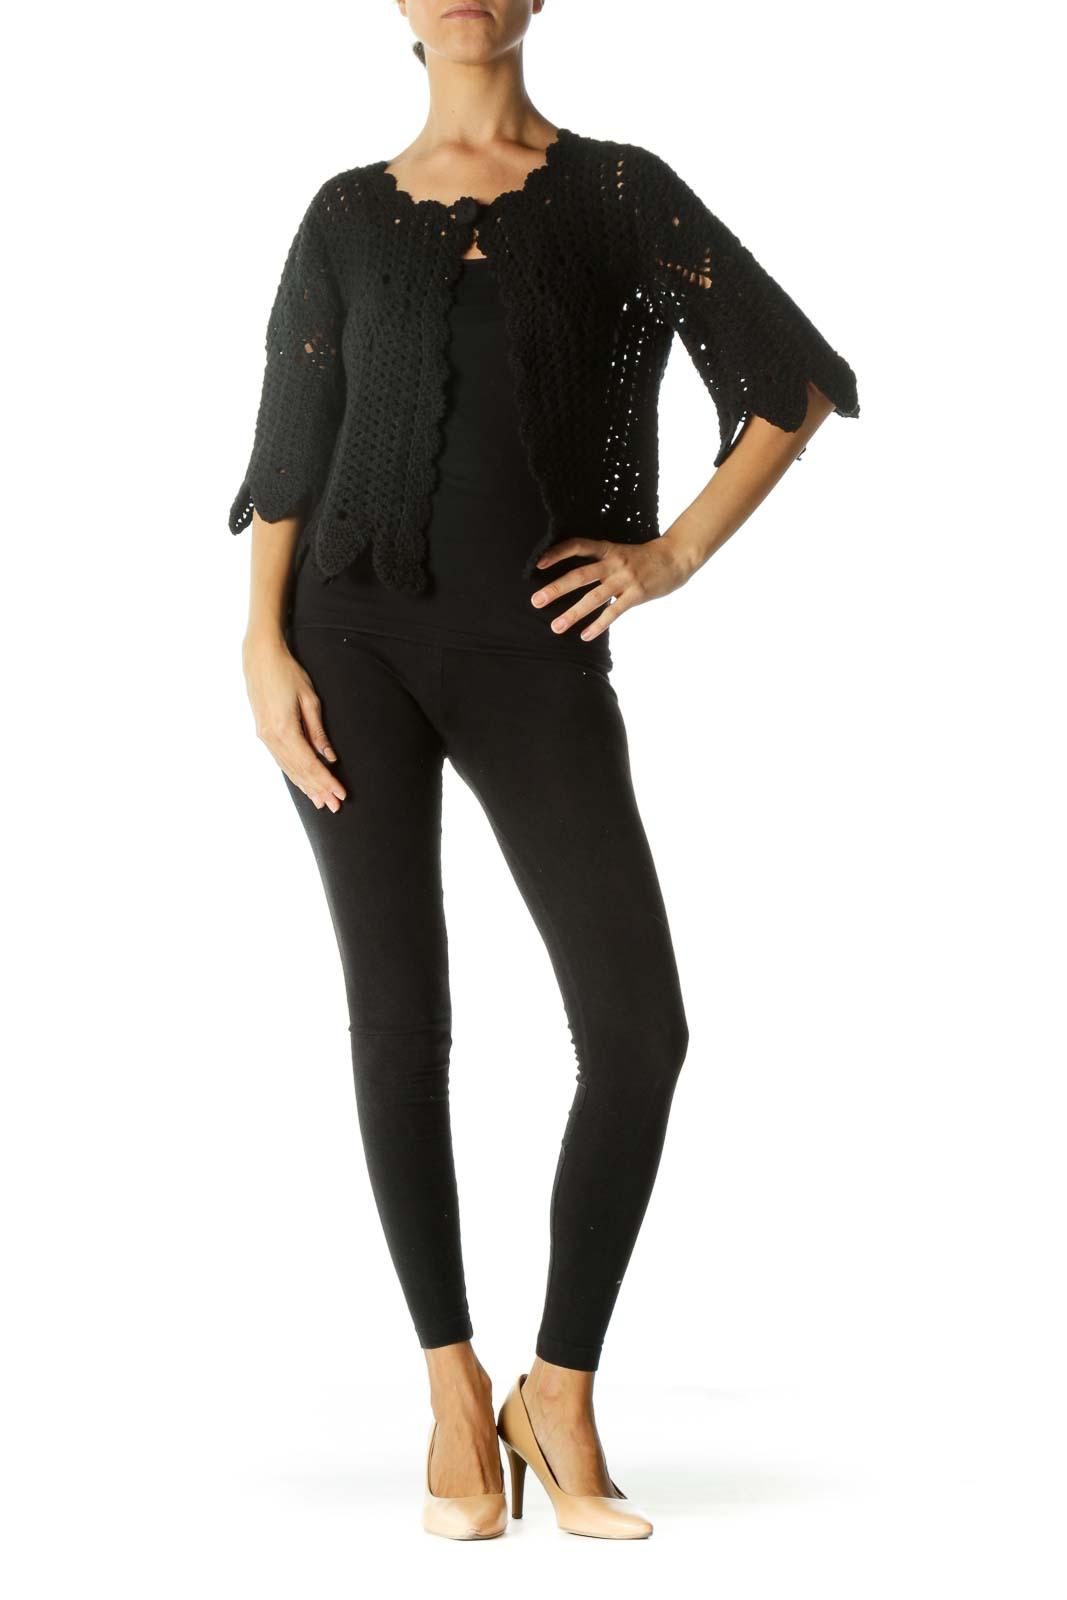 Black Soft 100% Long-Staple-Cotton Knit Single-Button Sweater